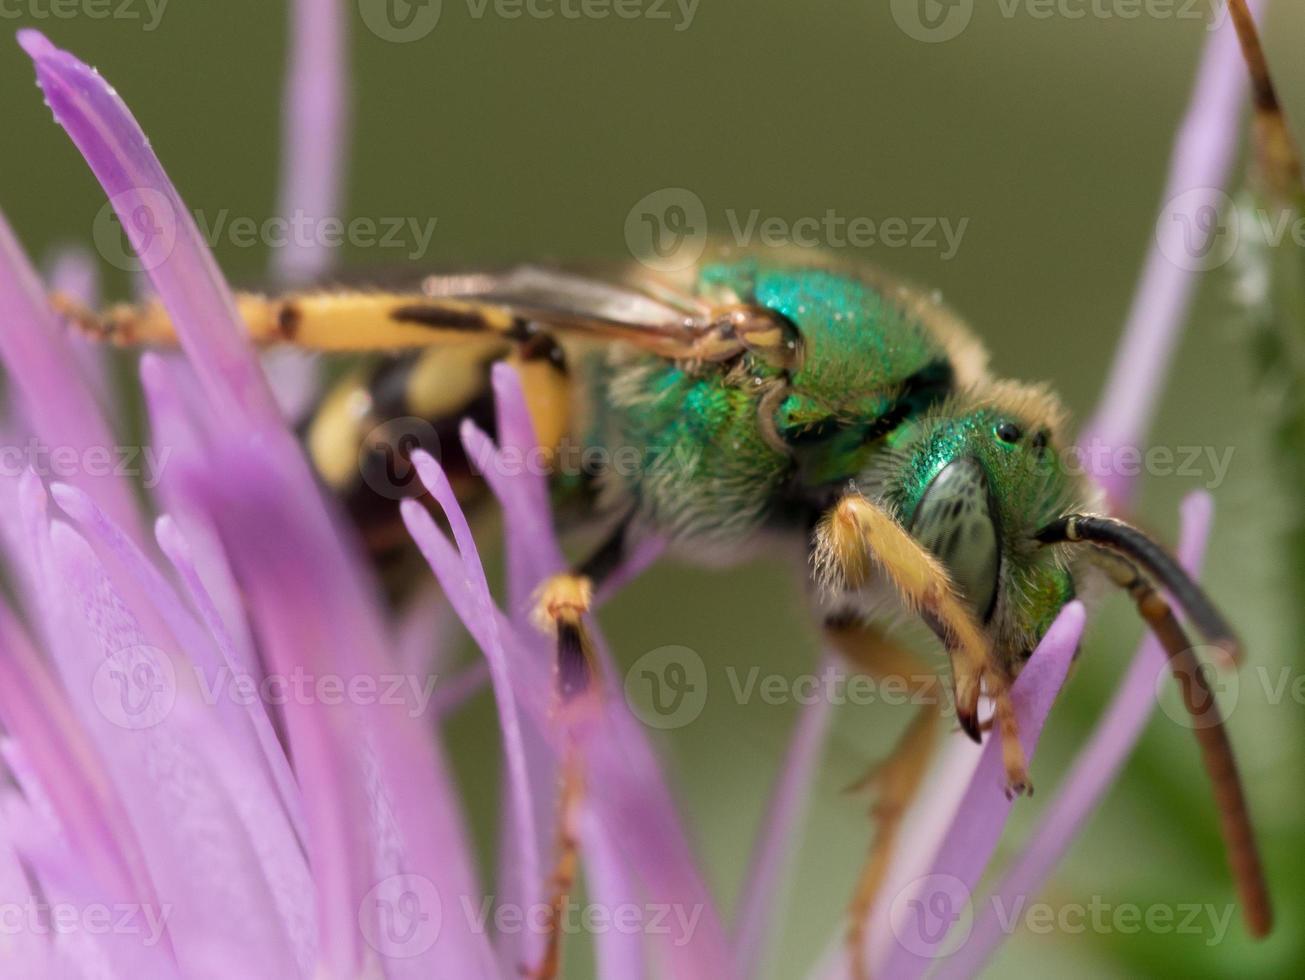 abeja verde sudor metálico en flor morada foto